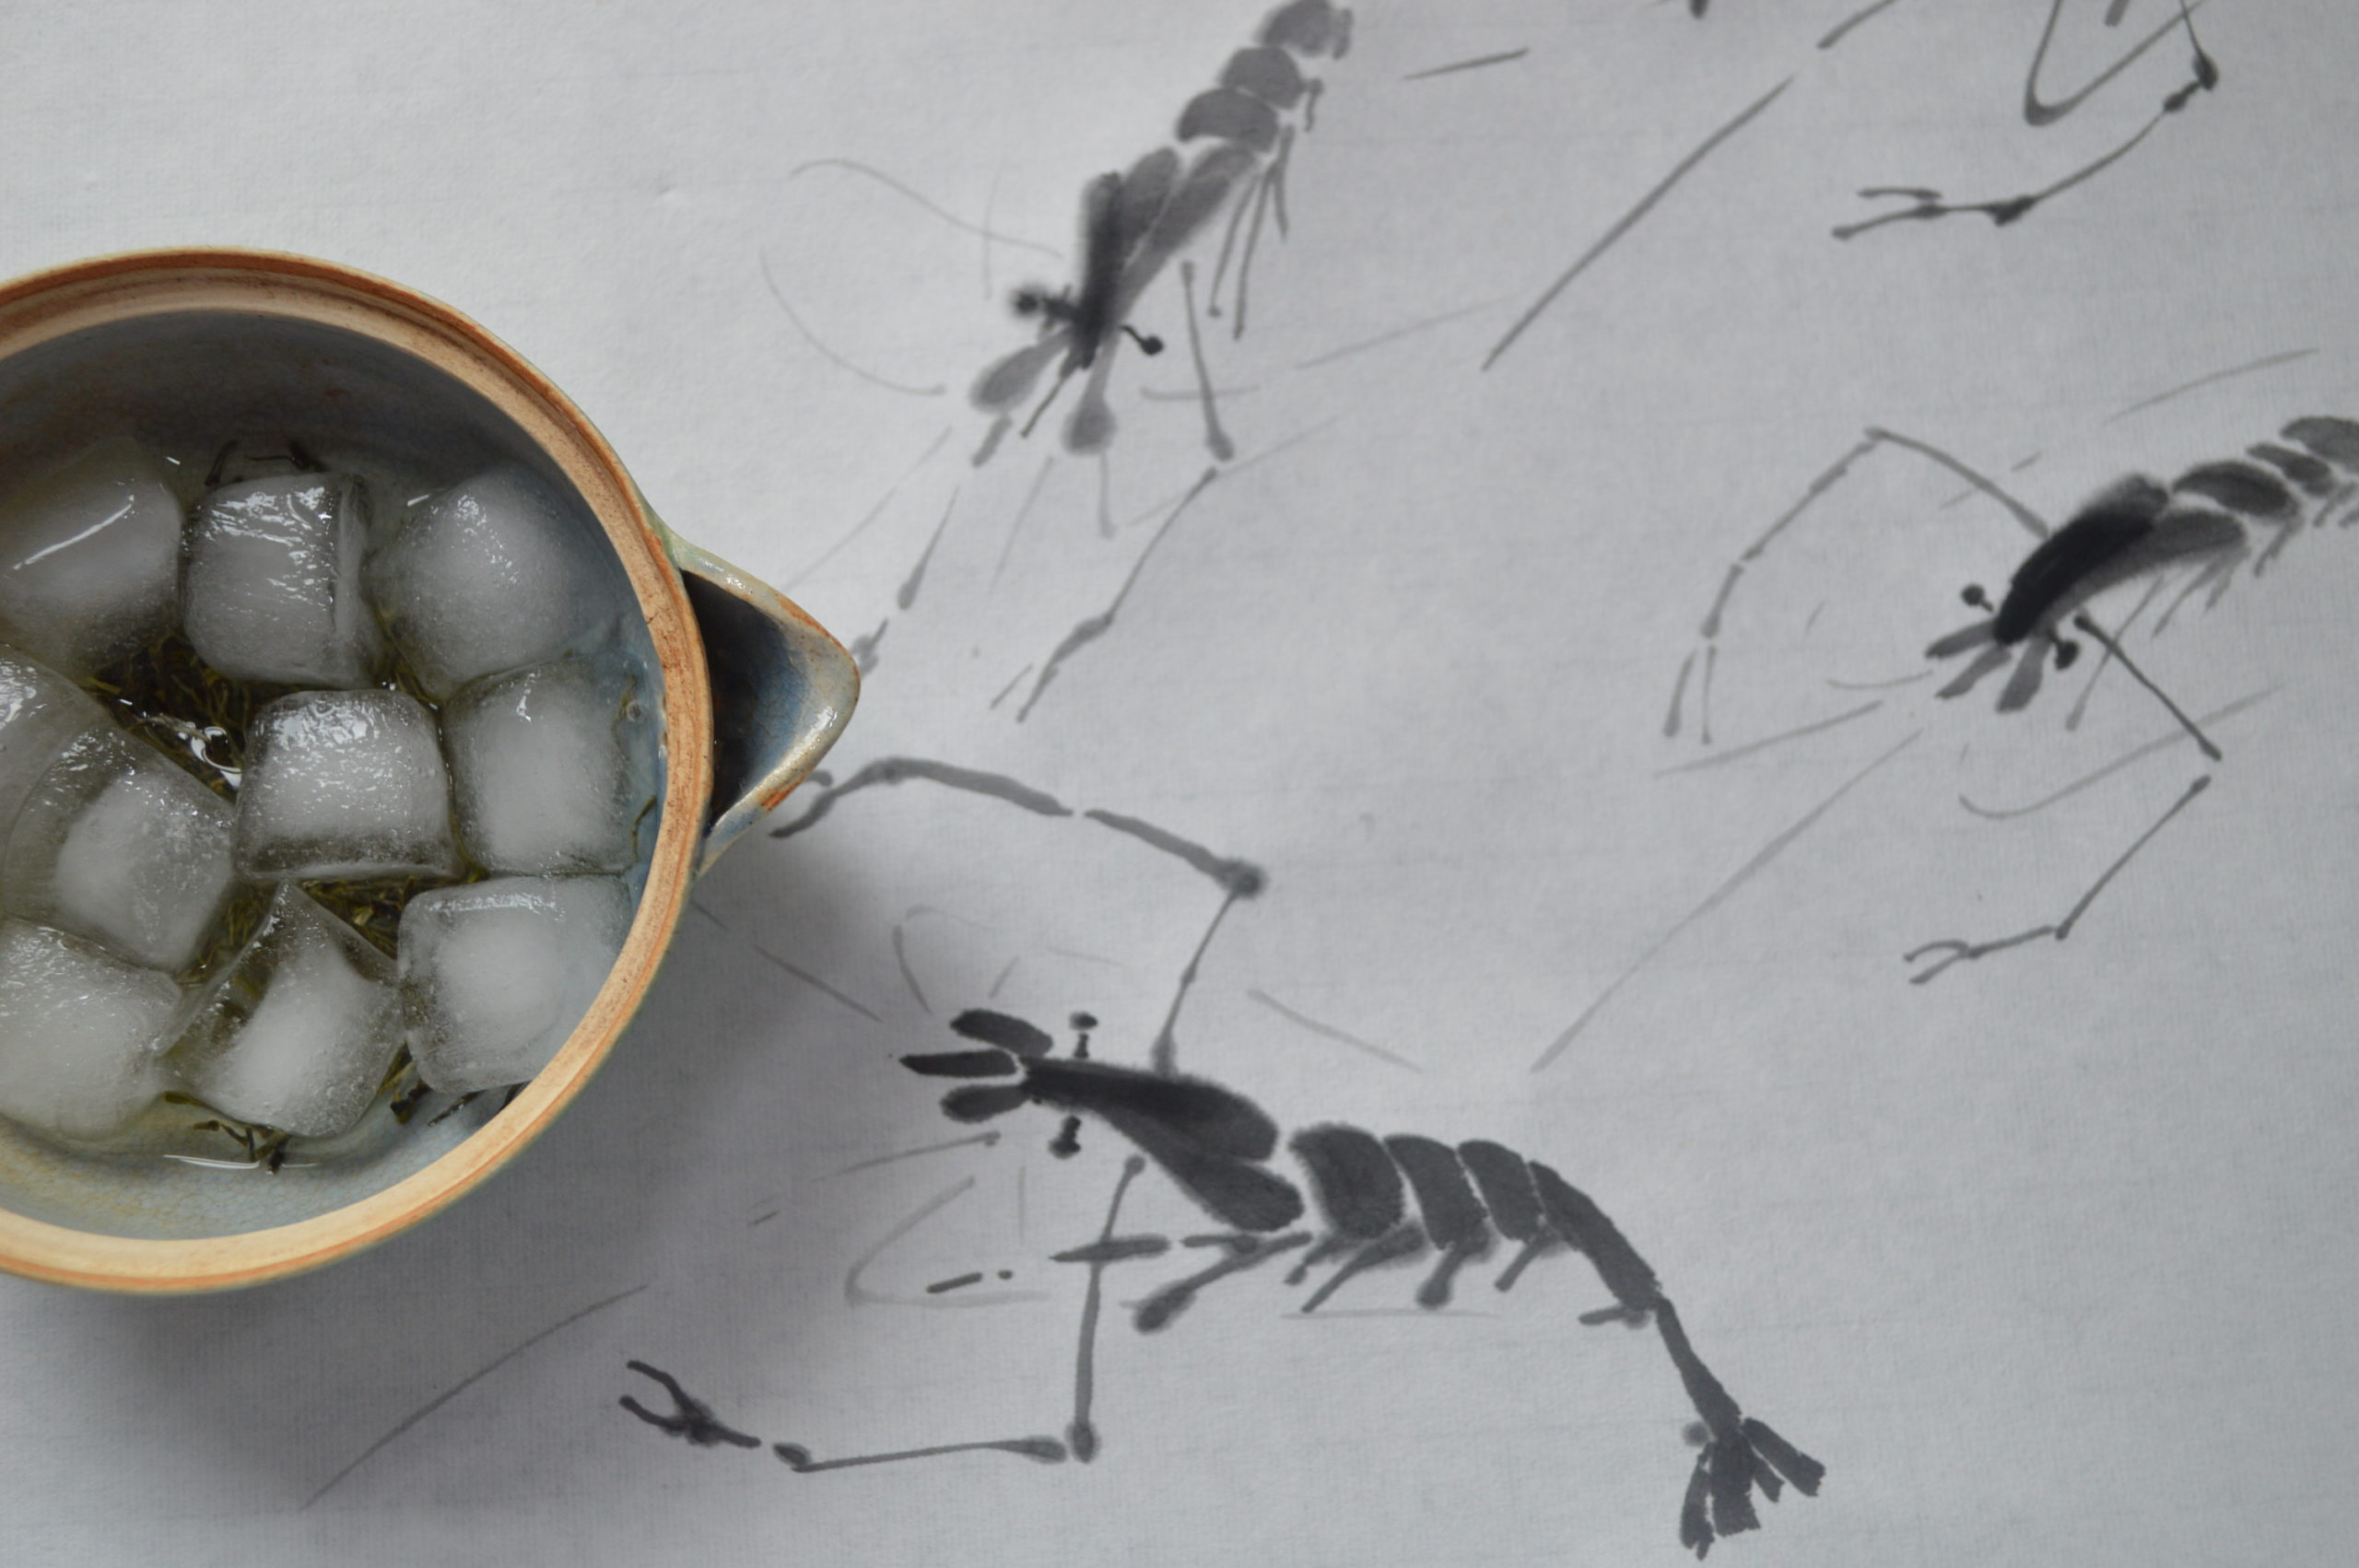 https://shop.liu-tea-art.com/wp-content/uploads/2020/08/DSC_0991-scaled.jpg